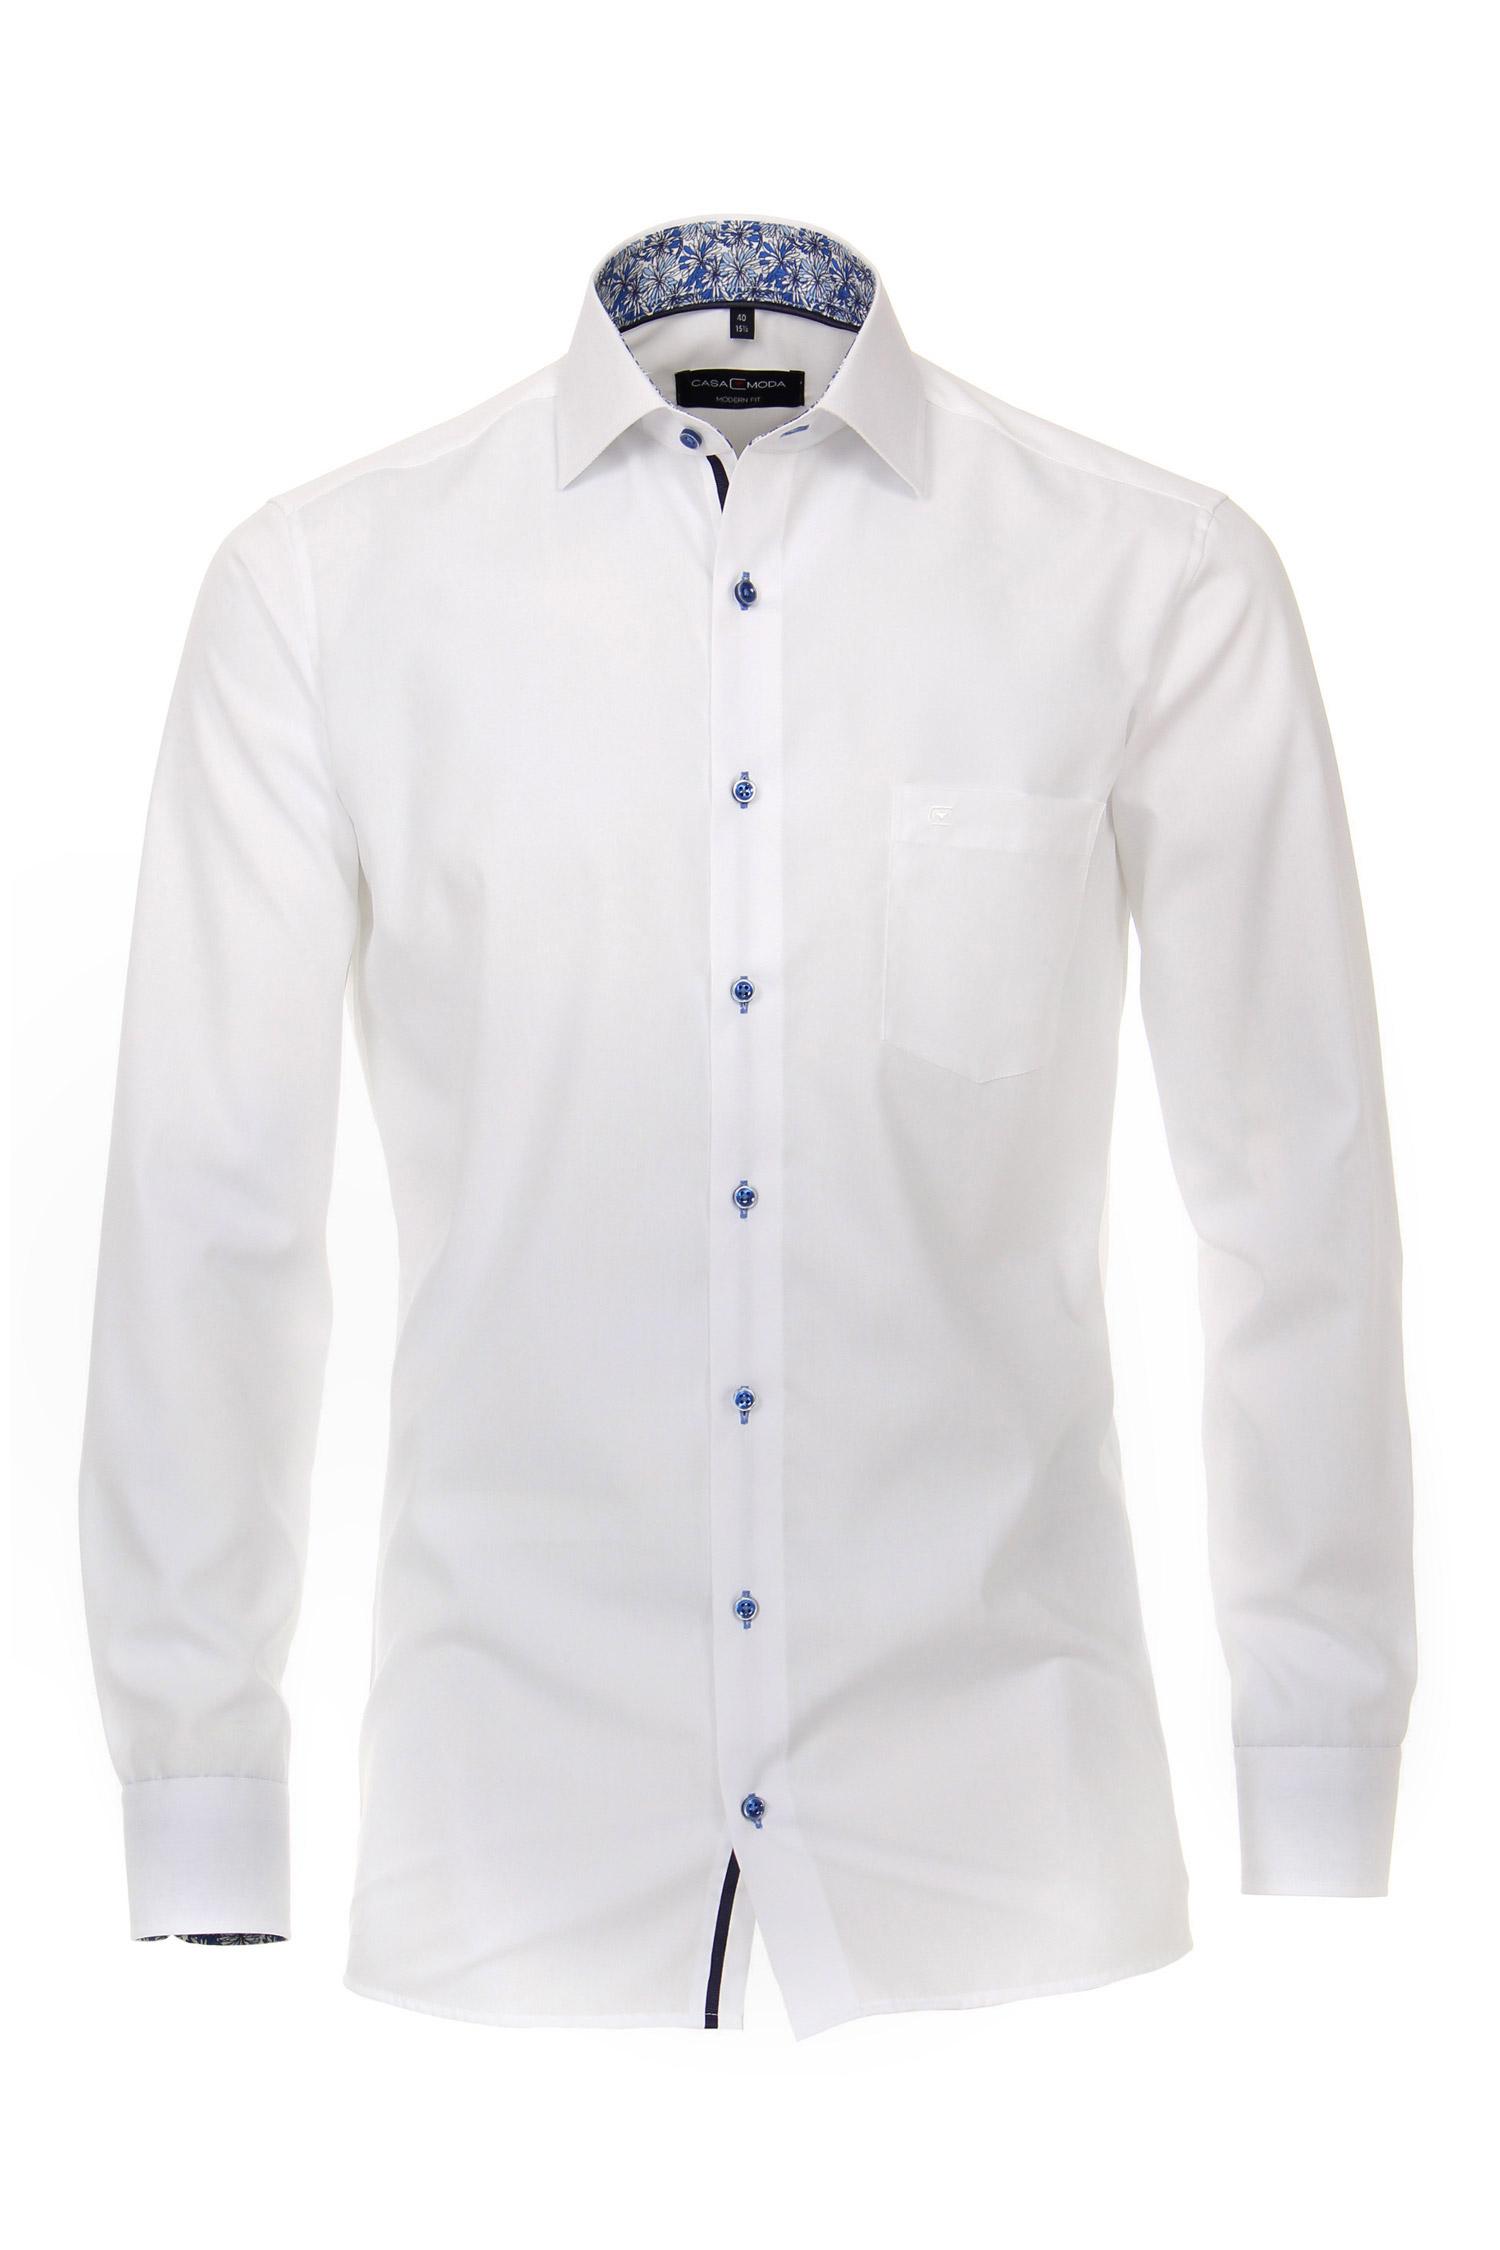 Camisas, Vestir Manga Larga, 110306, BLANCO | Zoom